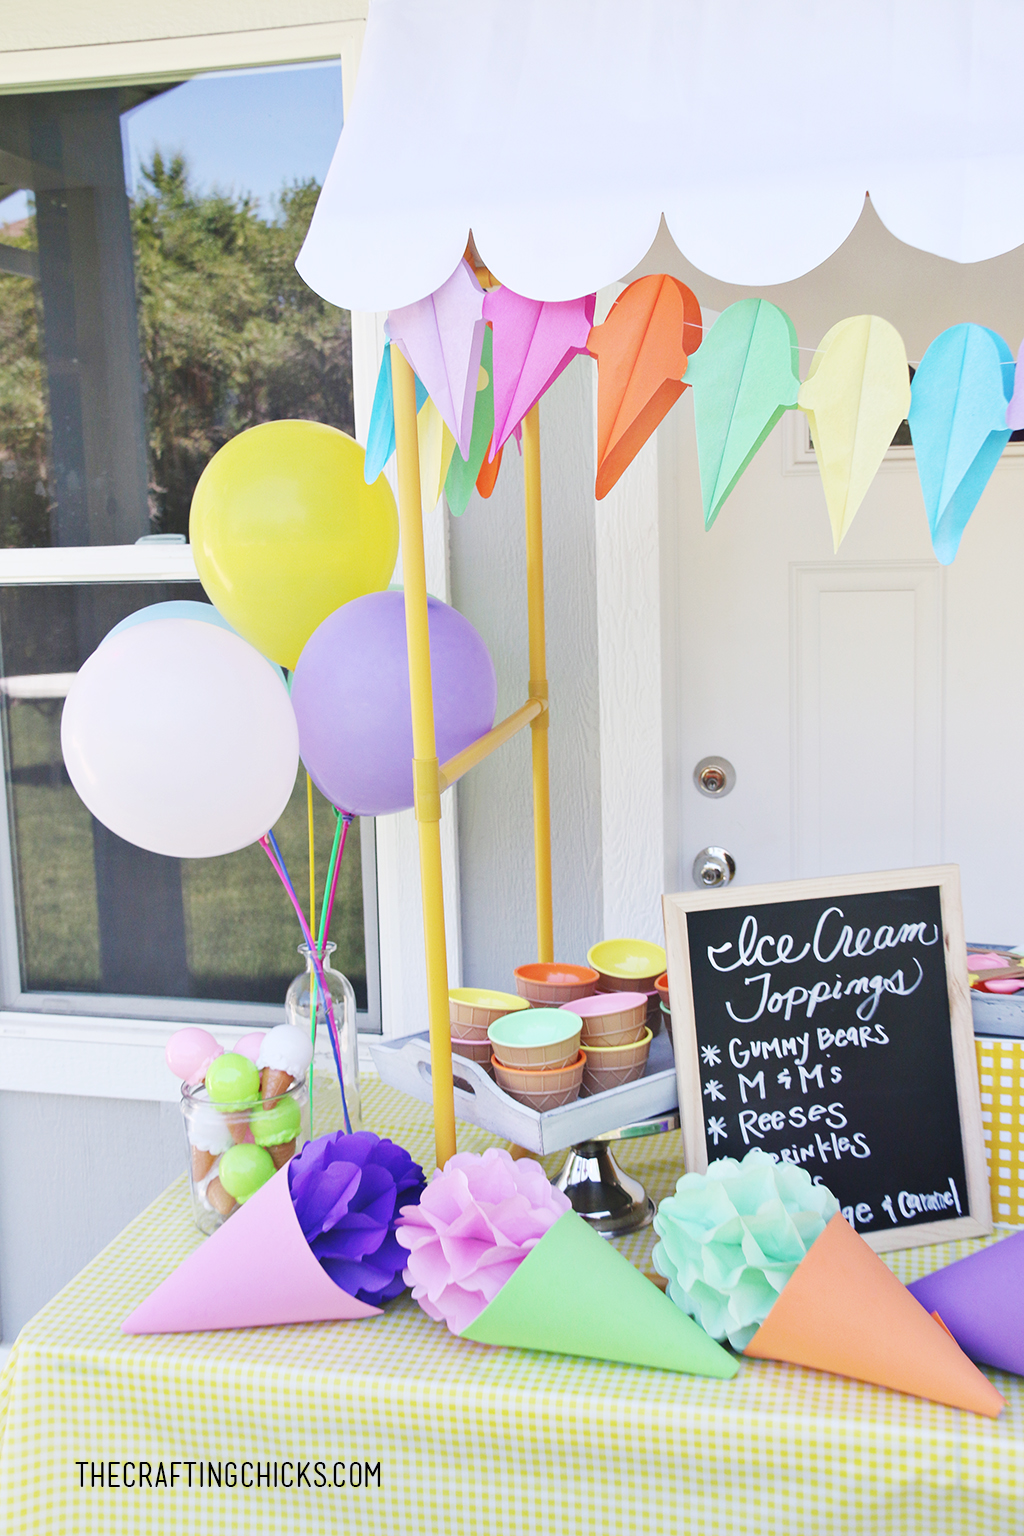 DIY Ice Cream Party Decor   The Crafting Chicks   Bloglovin'